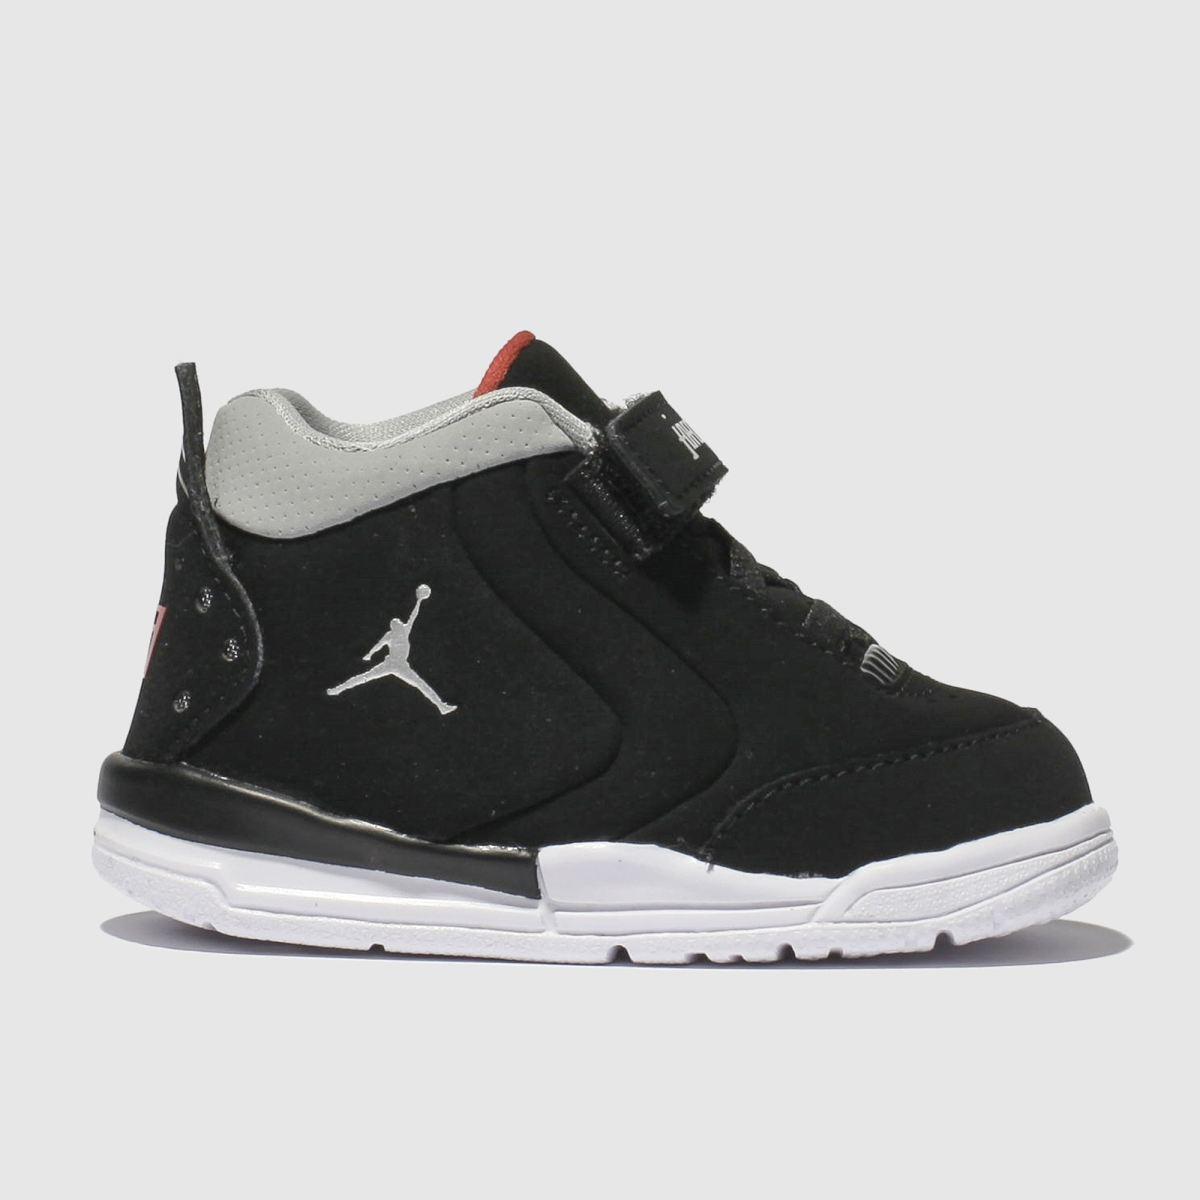 Nike Jordan Black & Silver Big Fund Trainers Toddler